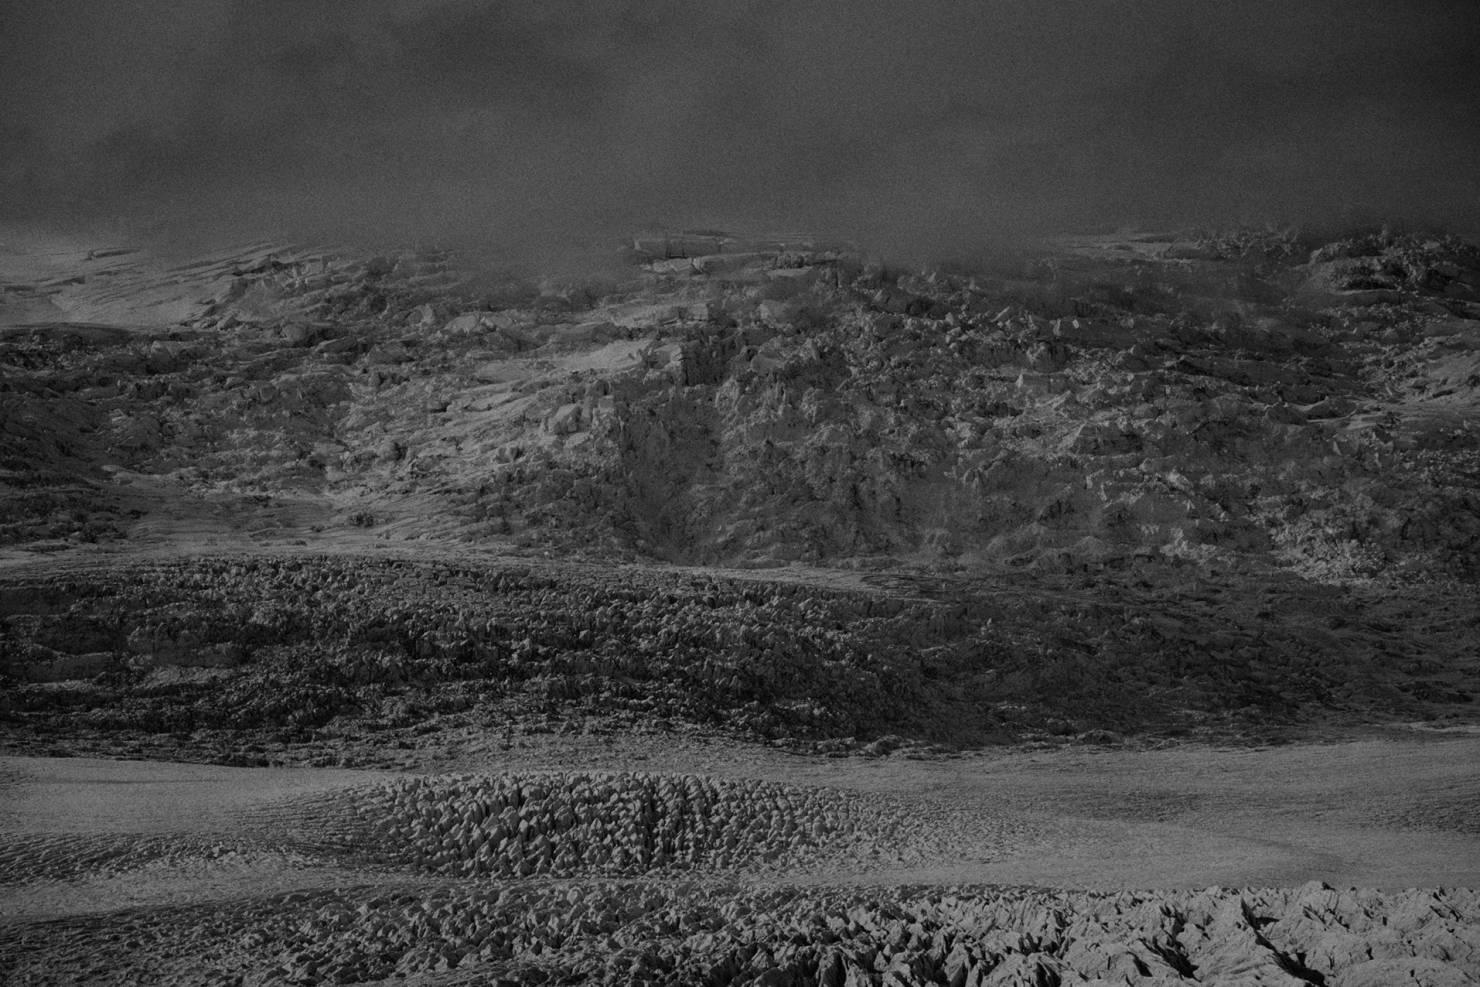 patrick_schuttler_landscape_iceland_010-f1c4224c0bad01cfd8e5dec453f20ed7